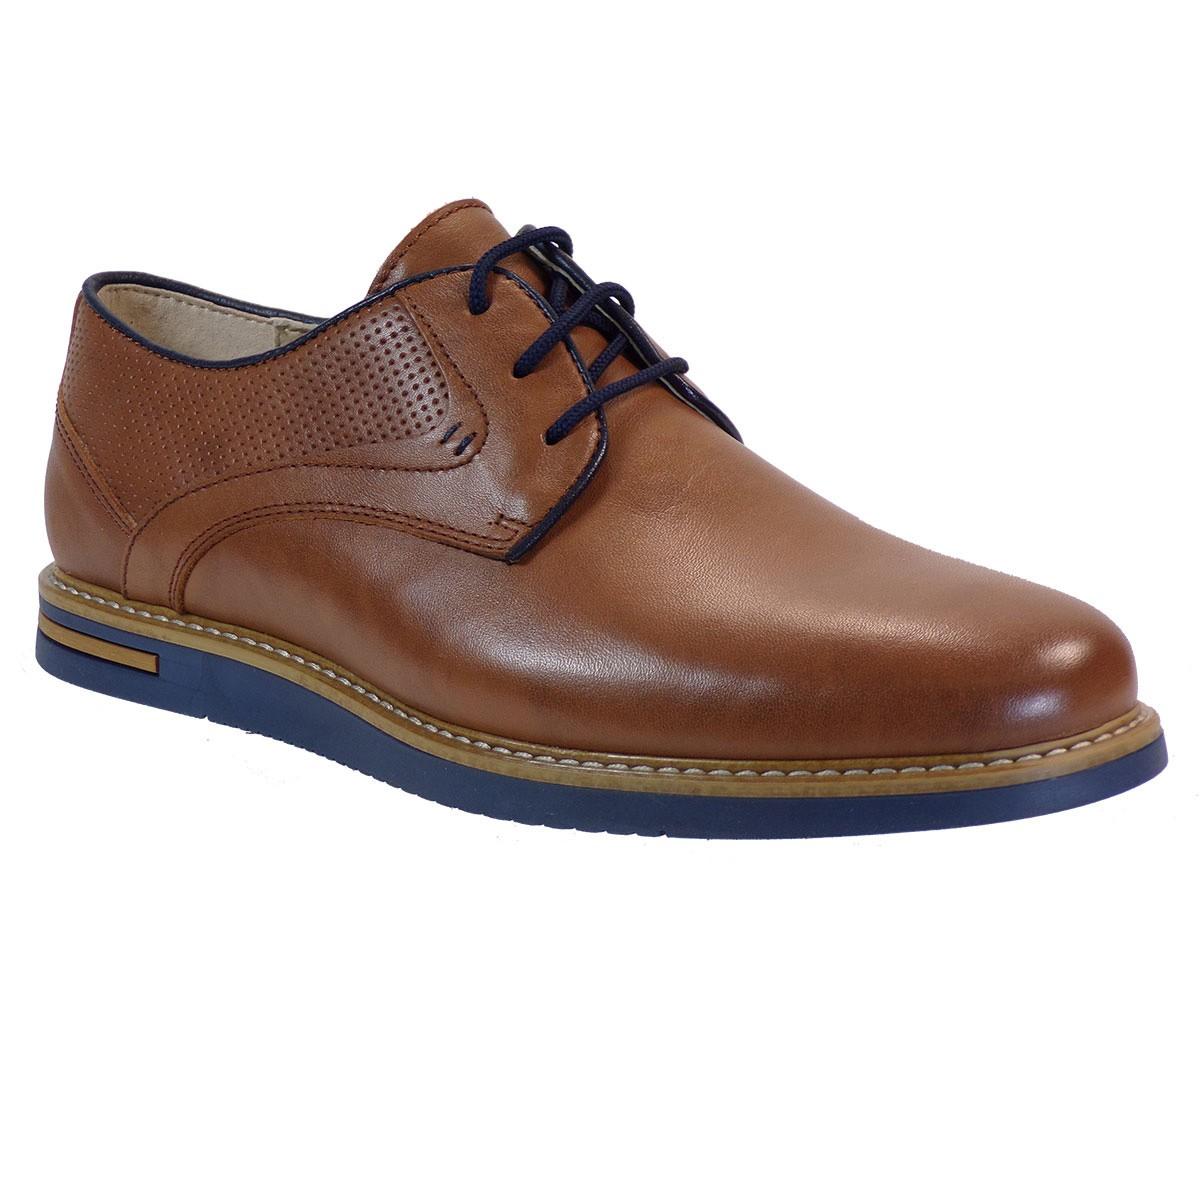 Softies Ανδρικά Παπούτσια 6997 Ταμπά Δέρμα